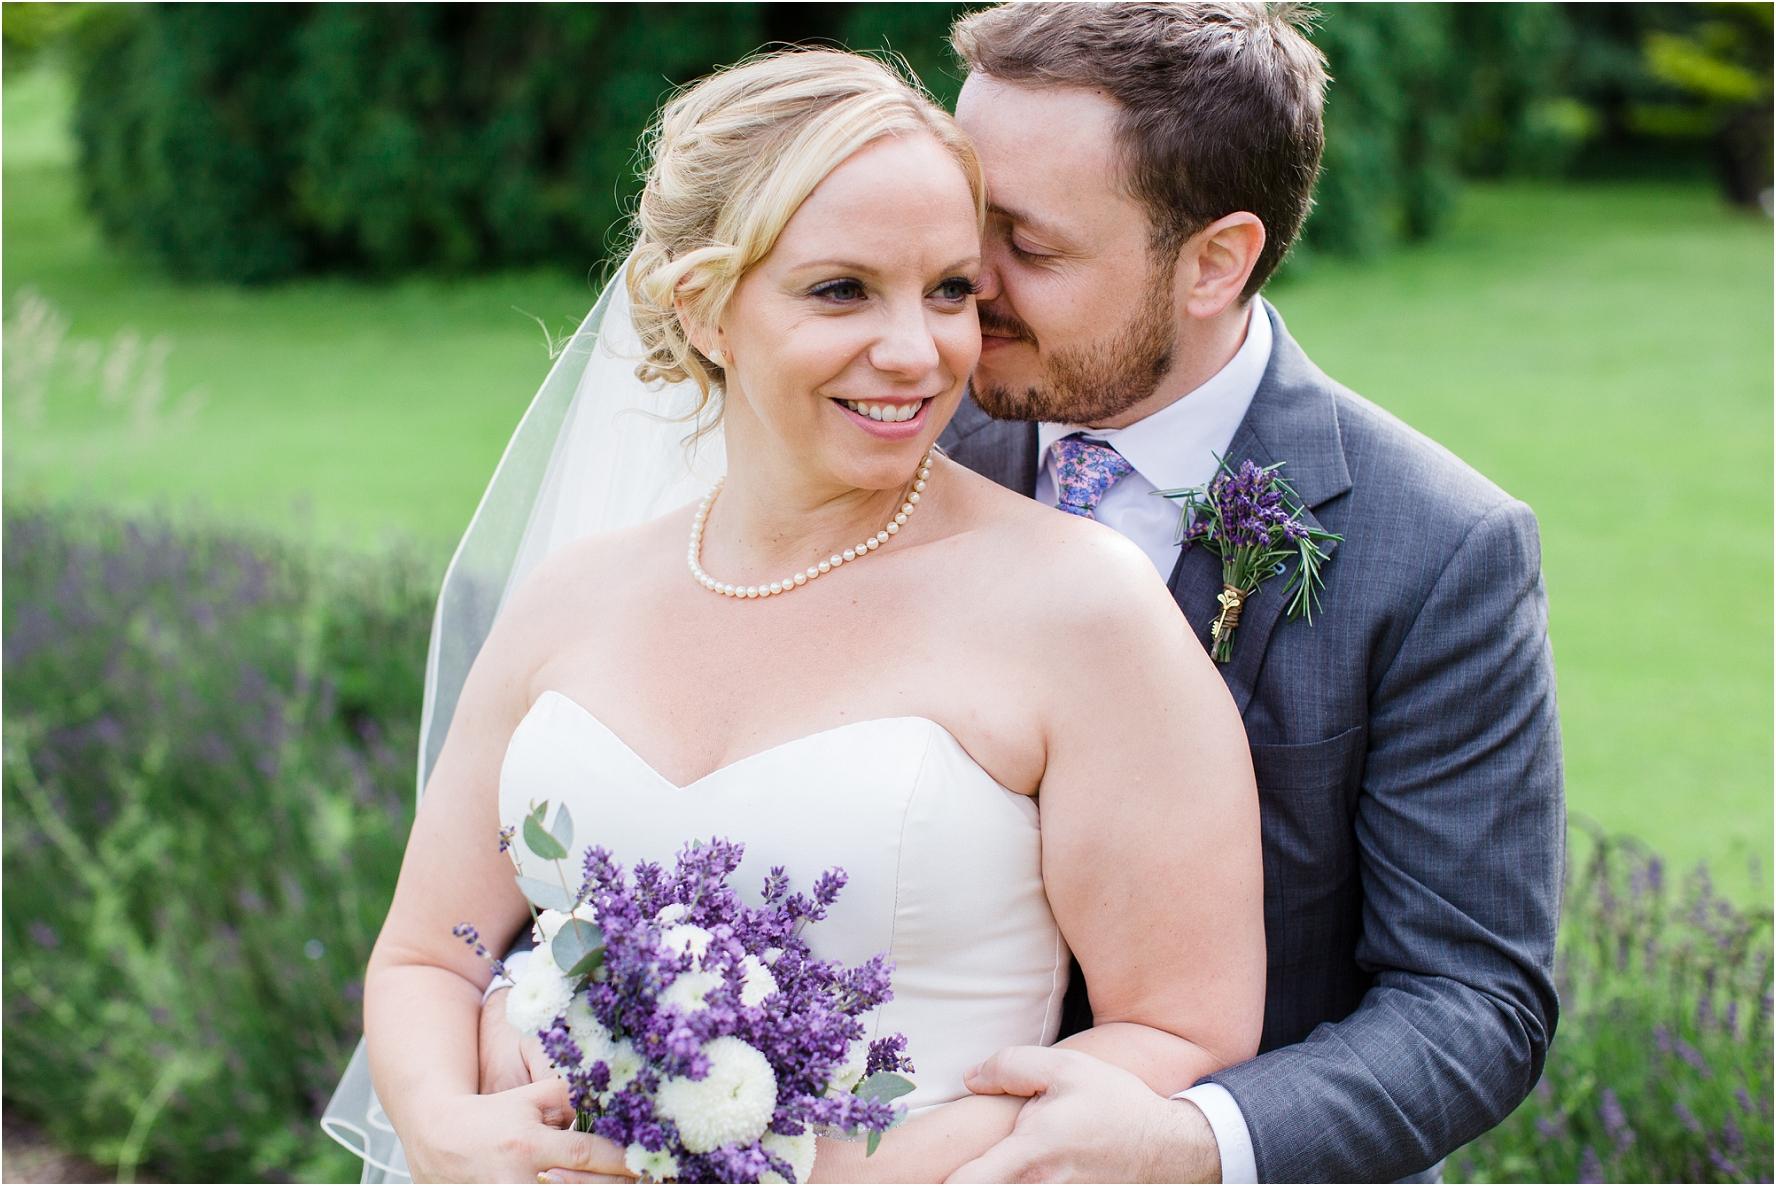 wedding-photography-the-orangery-settringham_0465